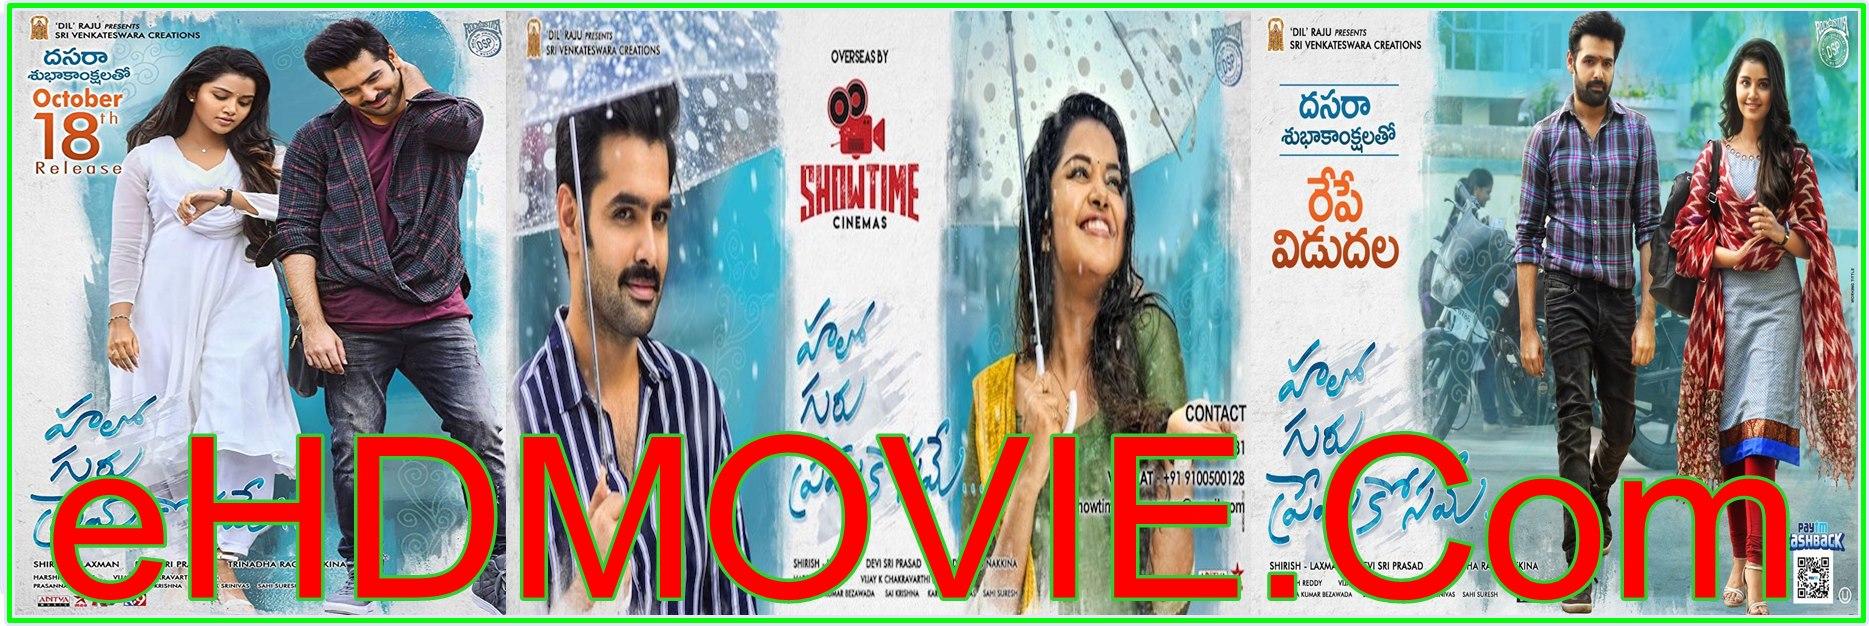 Hello Guru Prema Kosame 2018 Full Movie Telugu 720p - HEVC - 480p ORG HDRip 400MB - 700MB - 1.4GB ESubs Free Download